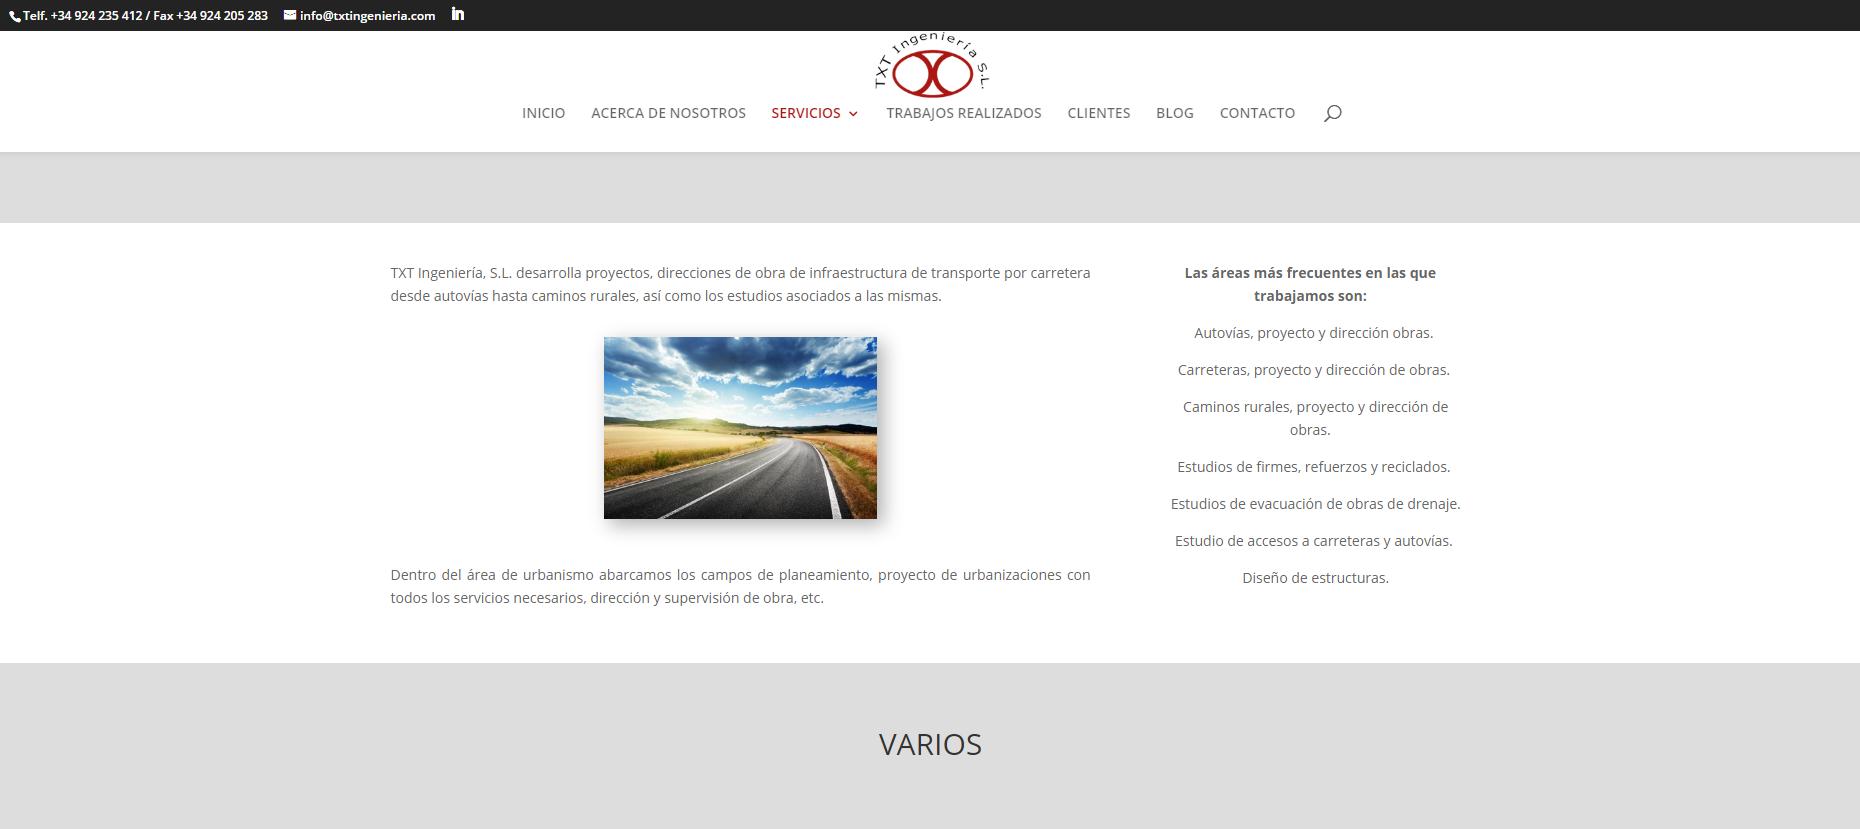 home txt para error anchors divi blog anchor error a carreteras